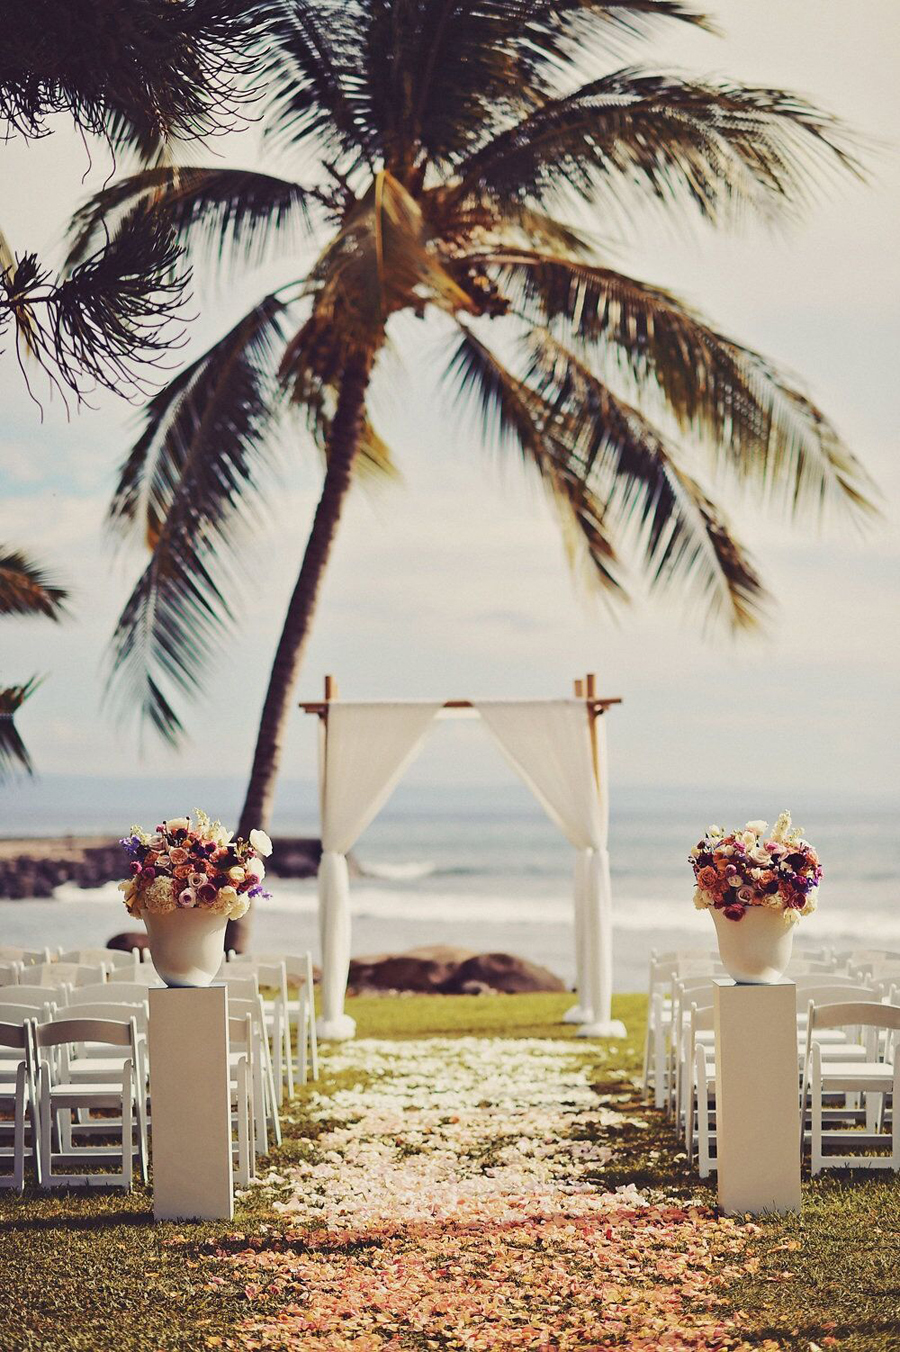 Ceremony, Ceremony Space, Ceremony Design, Maui, Hawaii